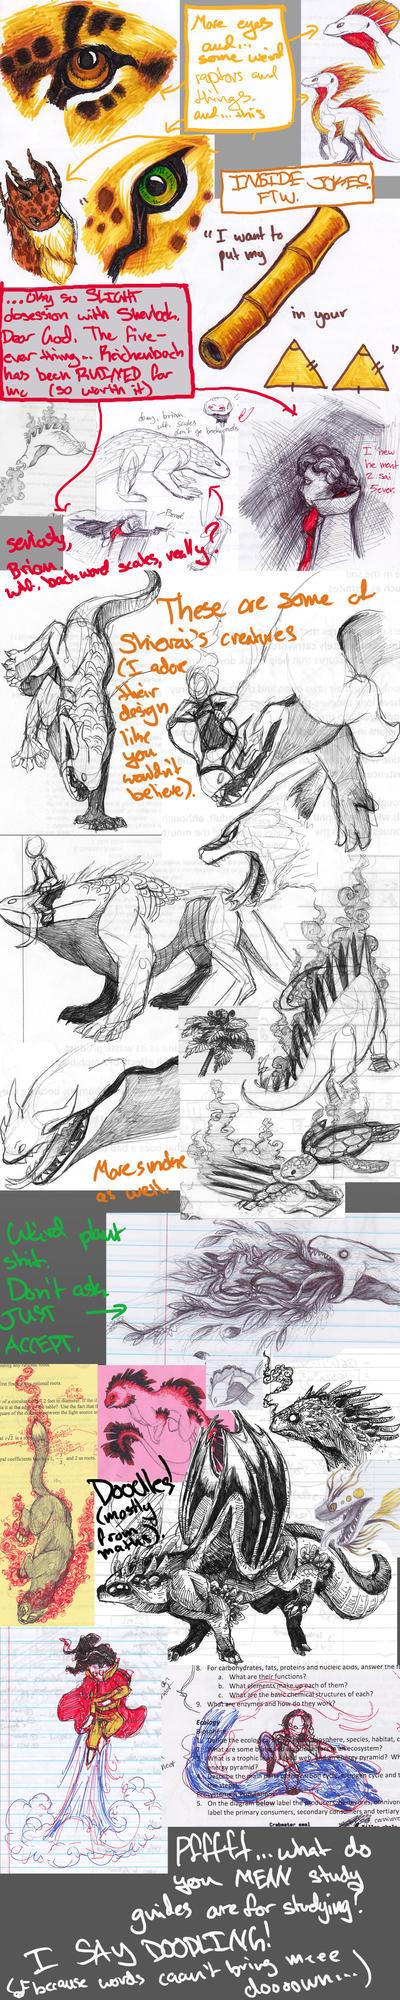 Sketchdump-Doodles From Finals by steppingskyward